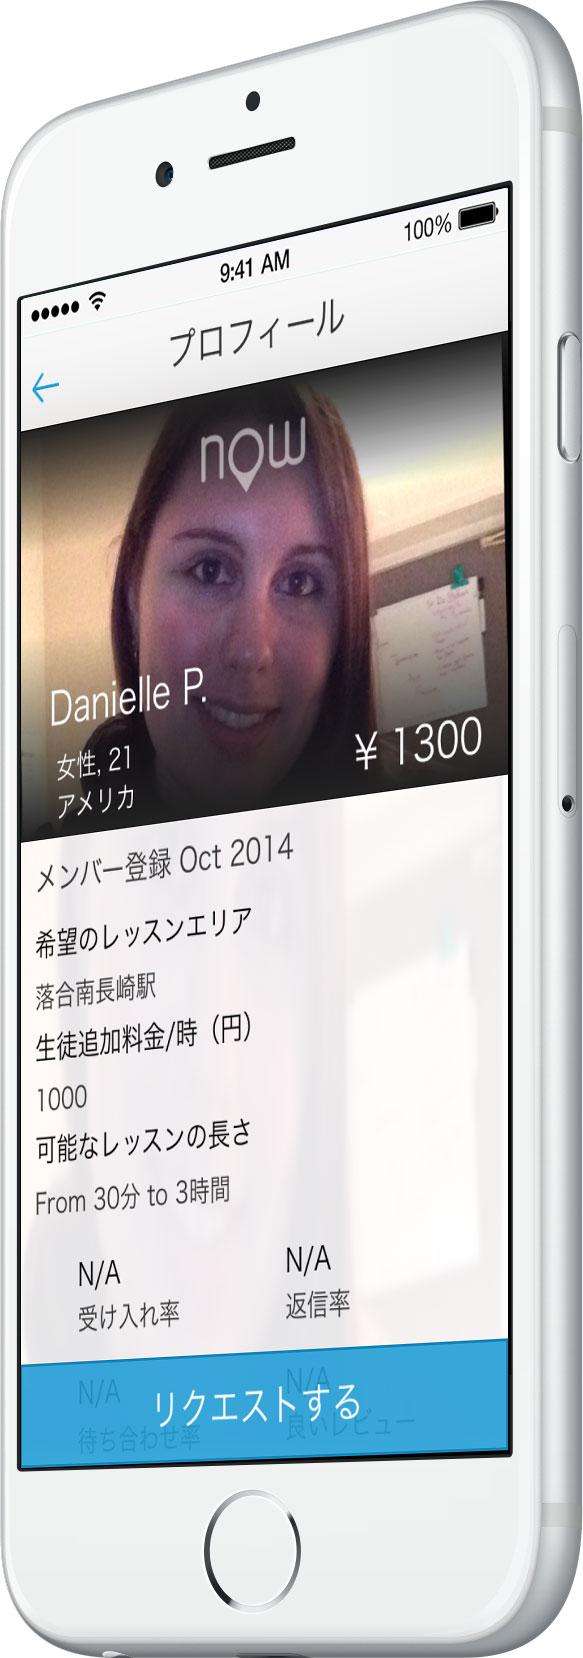 teacher_Danielle.jpg